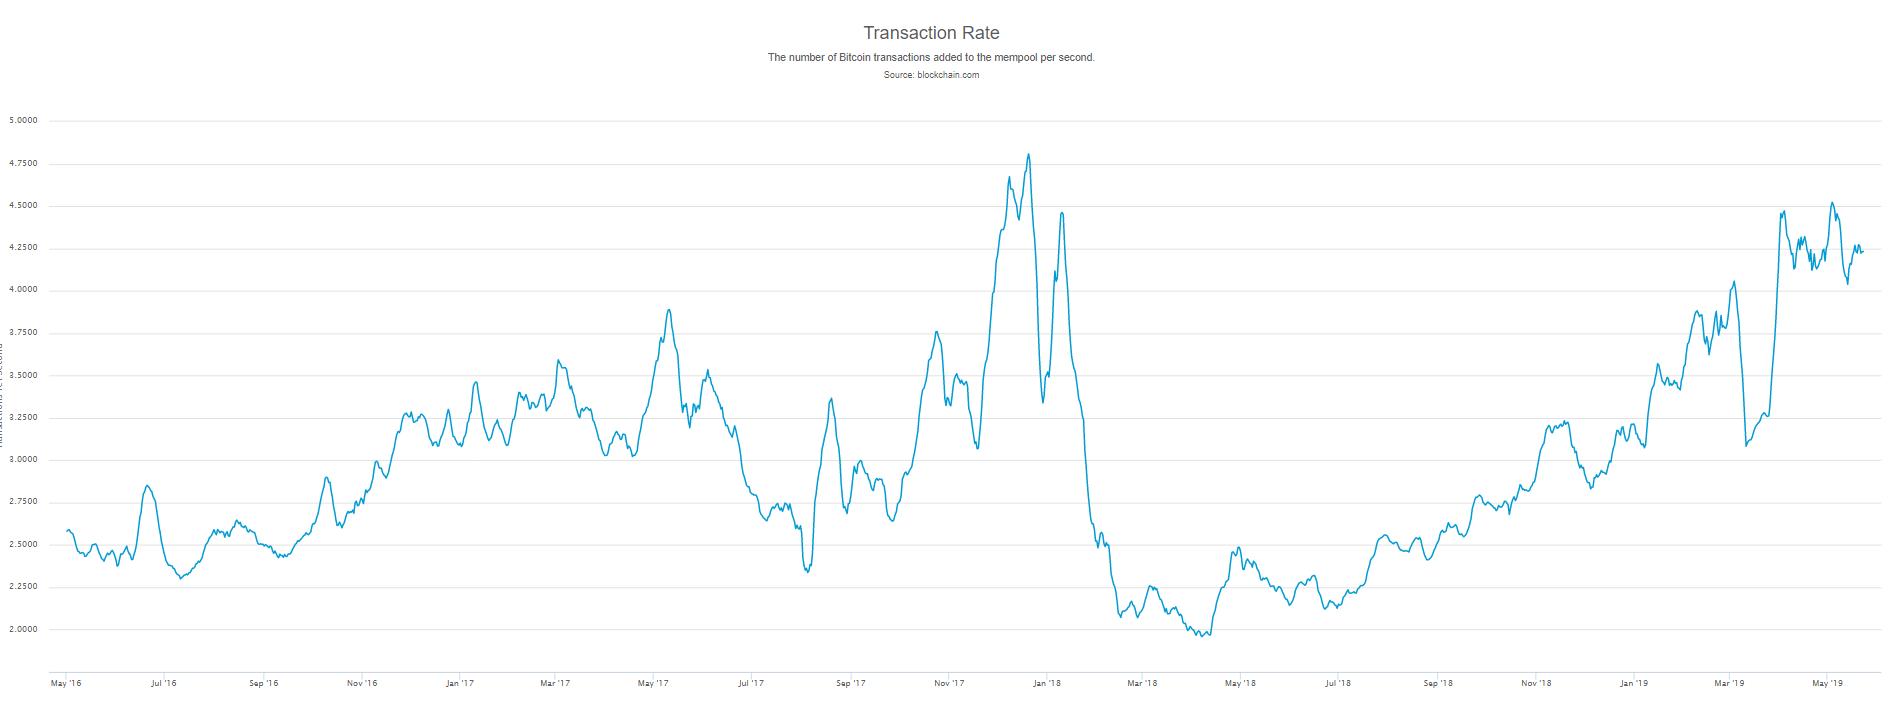 market, cryptocurrency, trading, bitcoin, blockchain, ethereum, crypto